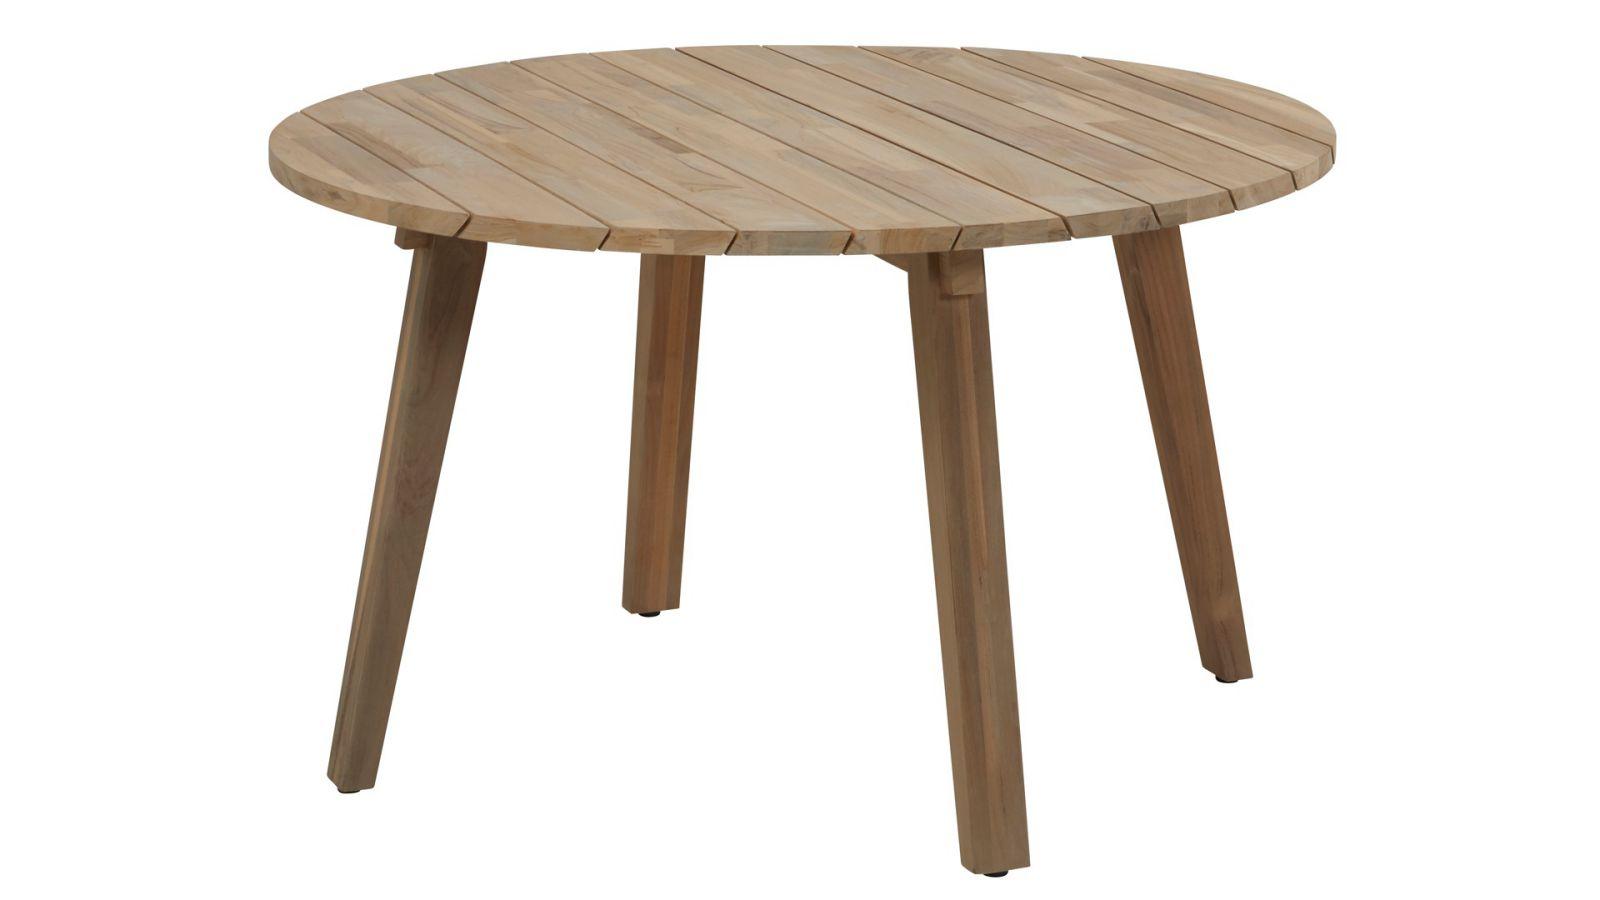 4 seasons outdoor lisboa dining set met derby dining tafel sale latour. Black Bedroom Furniture Sets. Home Design Ideas